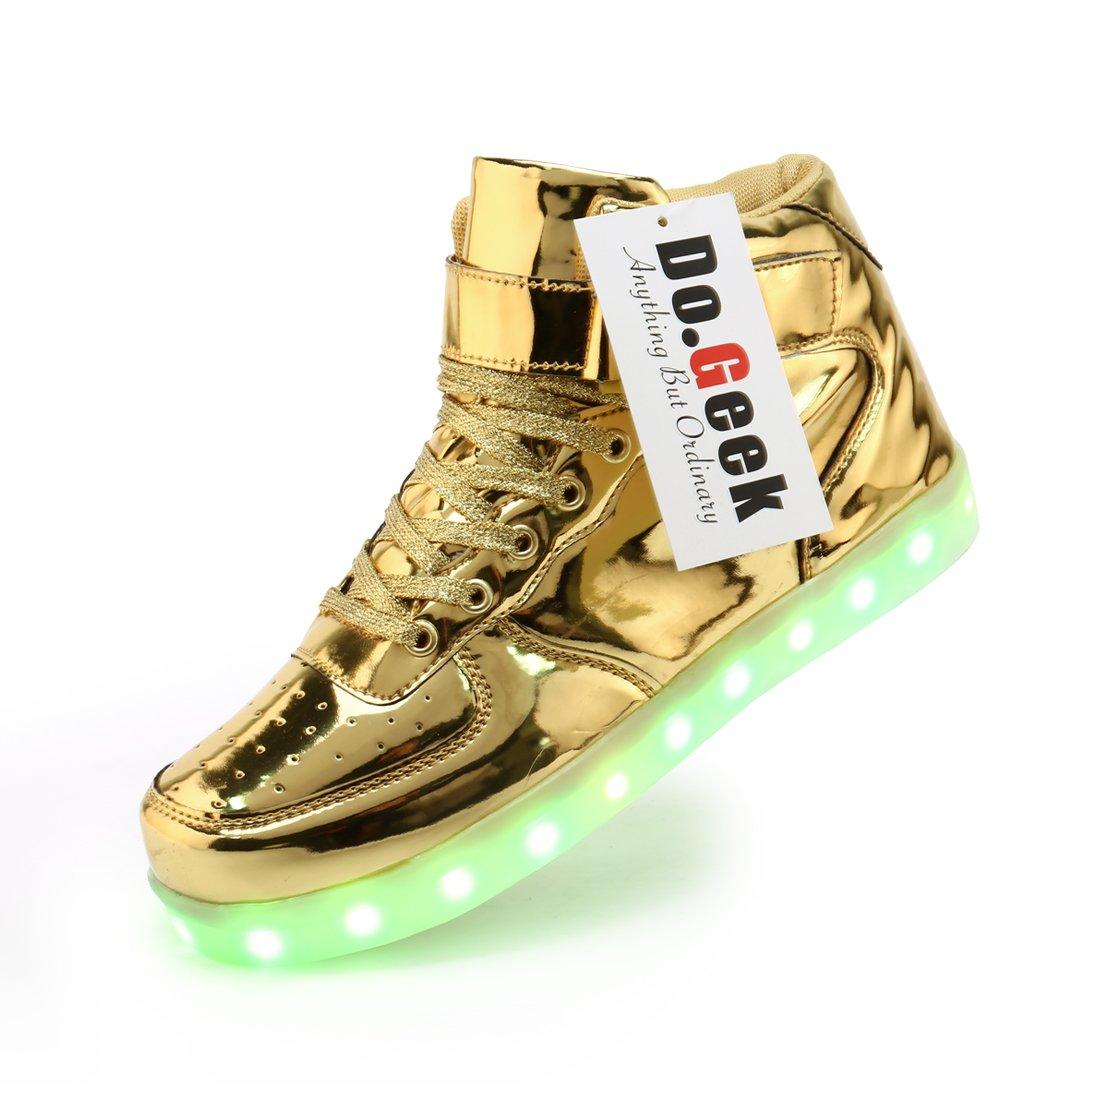 DoGeek Unisex Light up Shoes for Adult 7 Colors Lights High Tops (Choose Half Size up) (10.5 B(M) US Women/7.5 D(M) US Men, Gold)